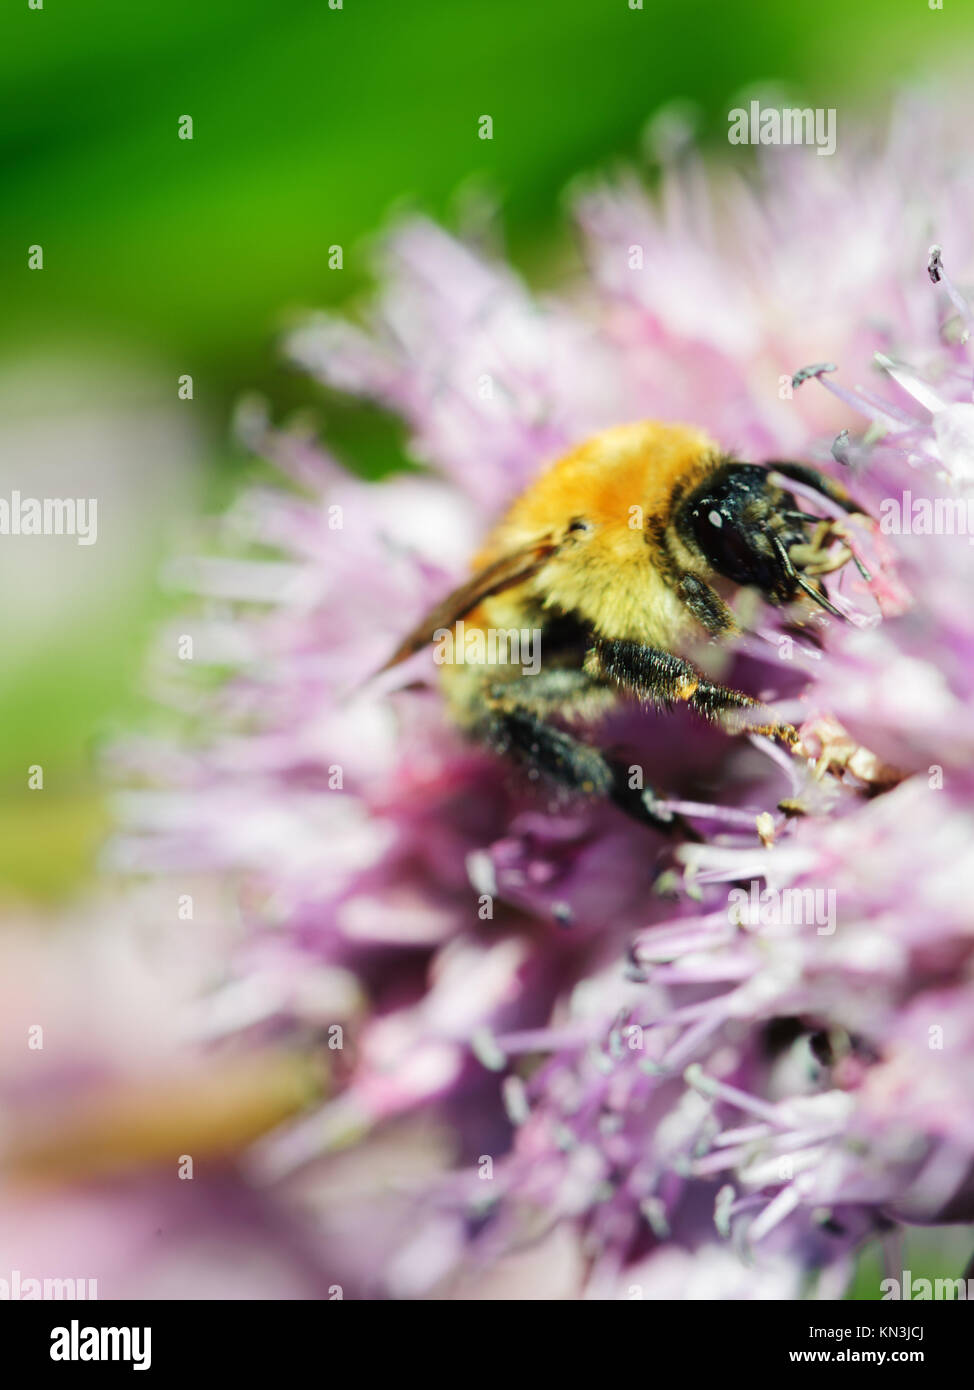 Macro shot of honey bee on blue flower. - Stock Image